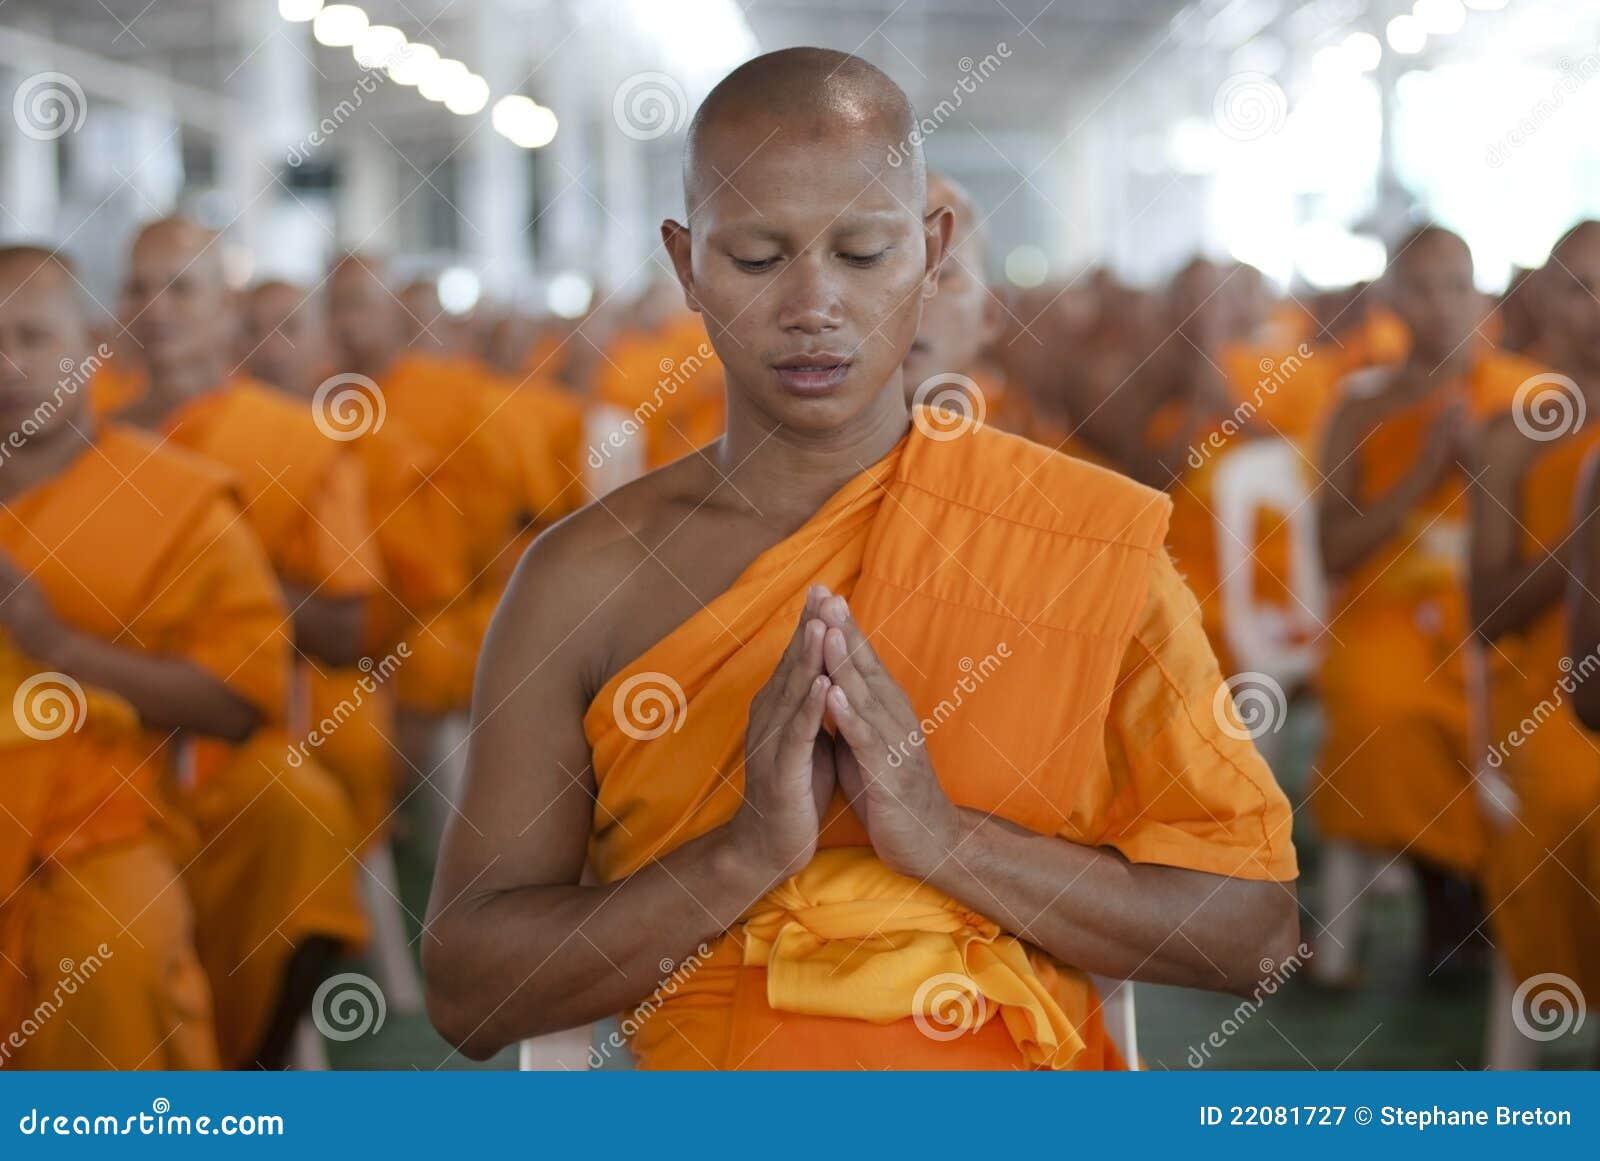 Rana pescatrice buddista in Tailandia